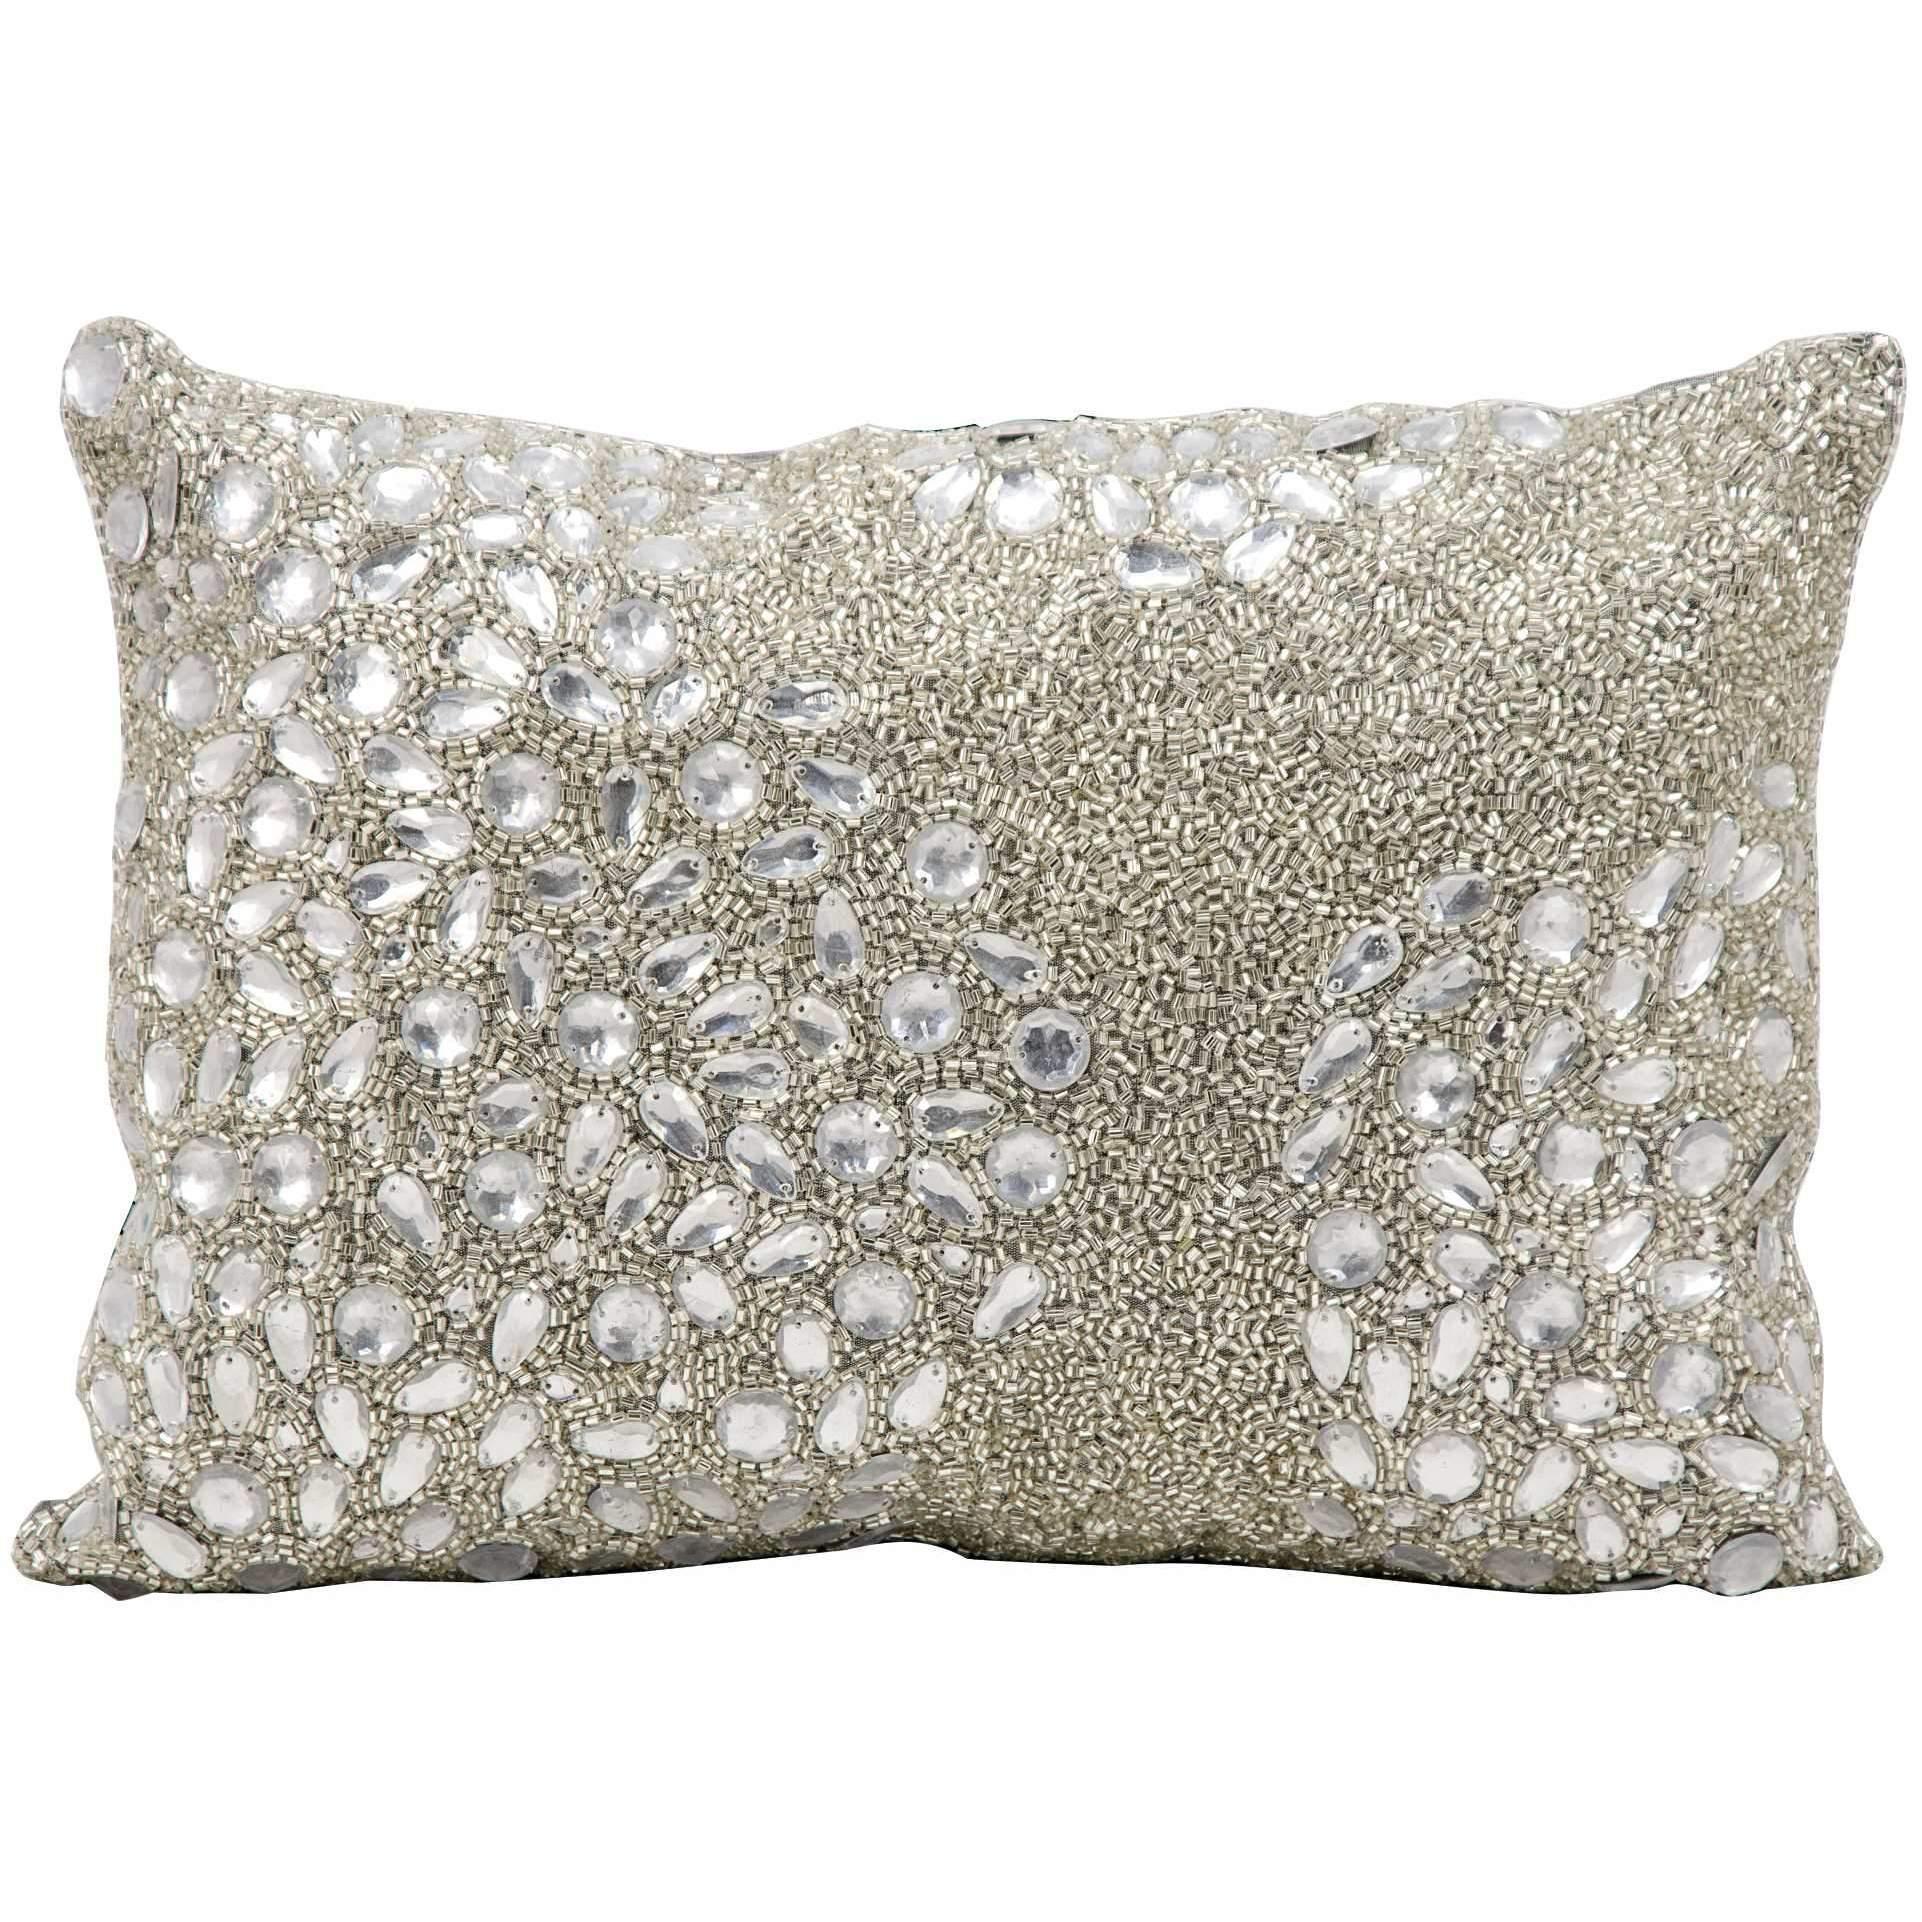 Mina Victory Luminecence Fully Beaded Silver Throw Pillow | Throw ...